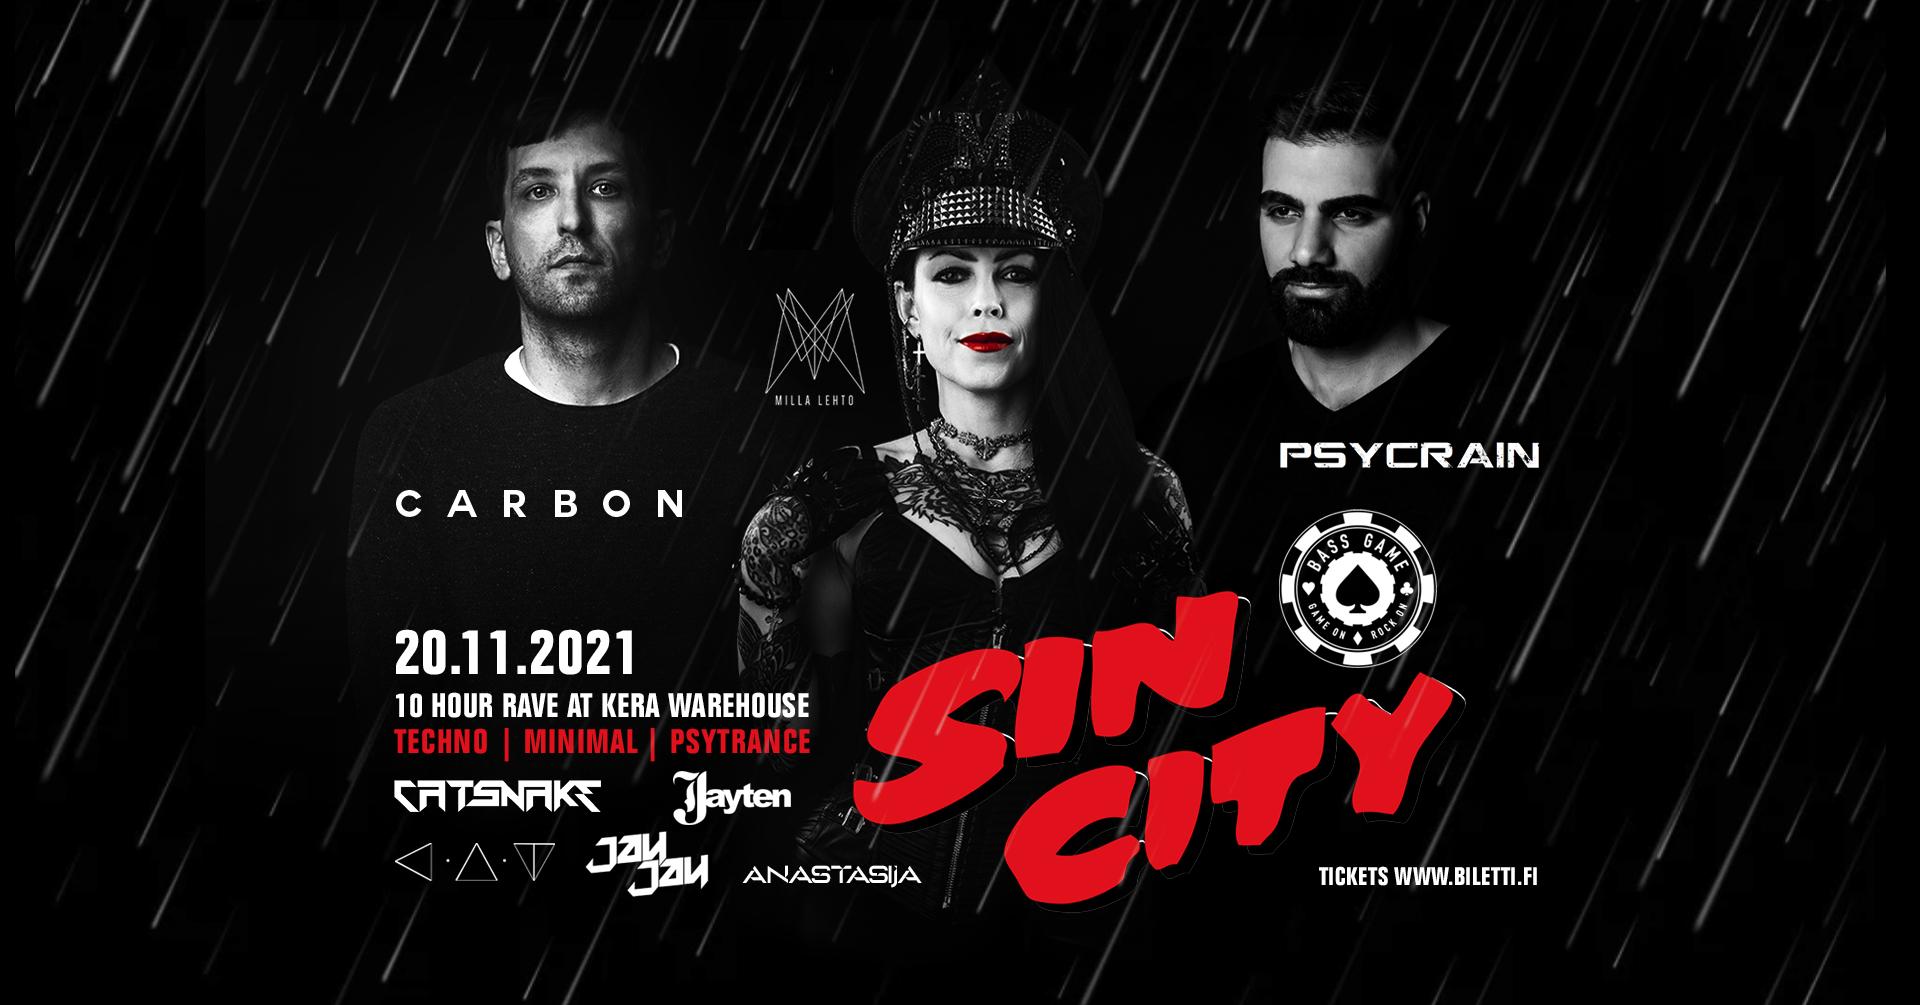 BASS GAME 6Y presents: SIN CITY w/ Carbon, Psycrain & Milla Lehto